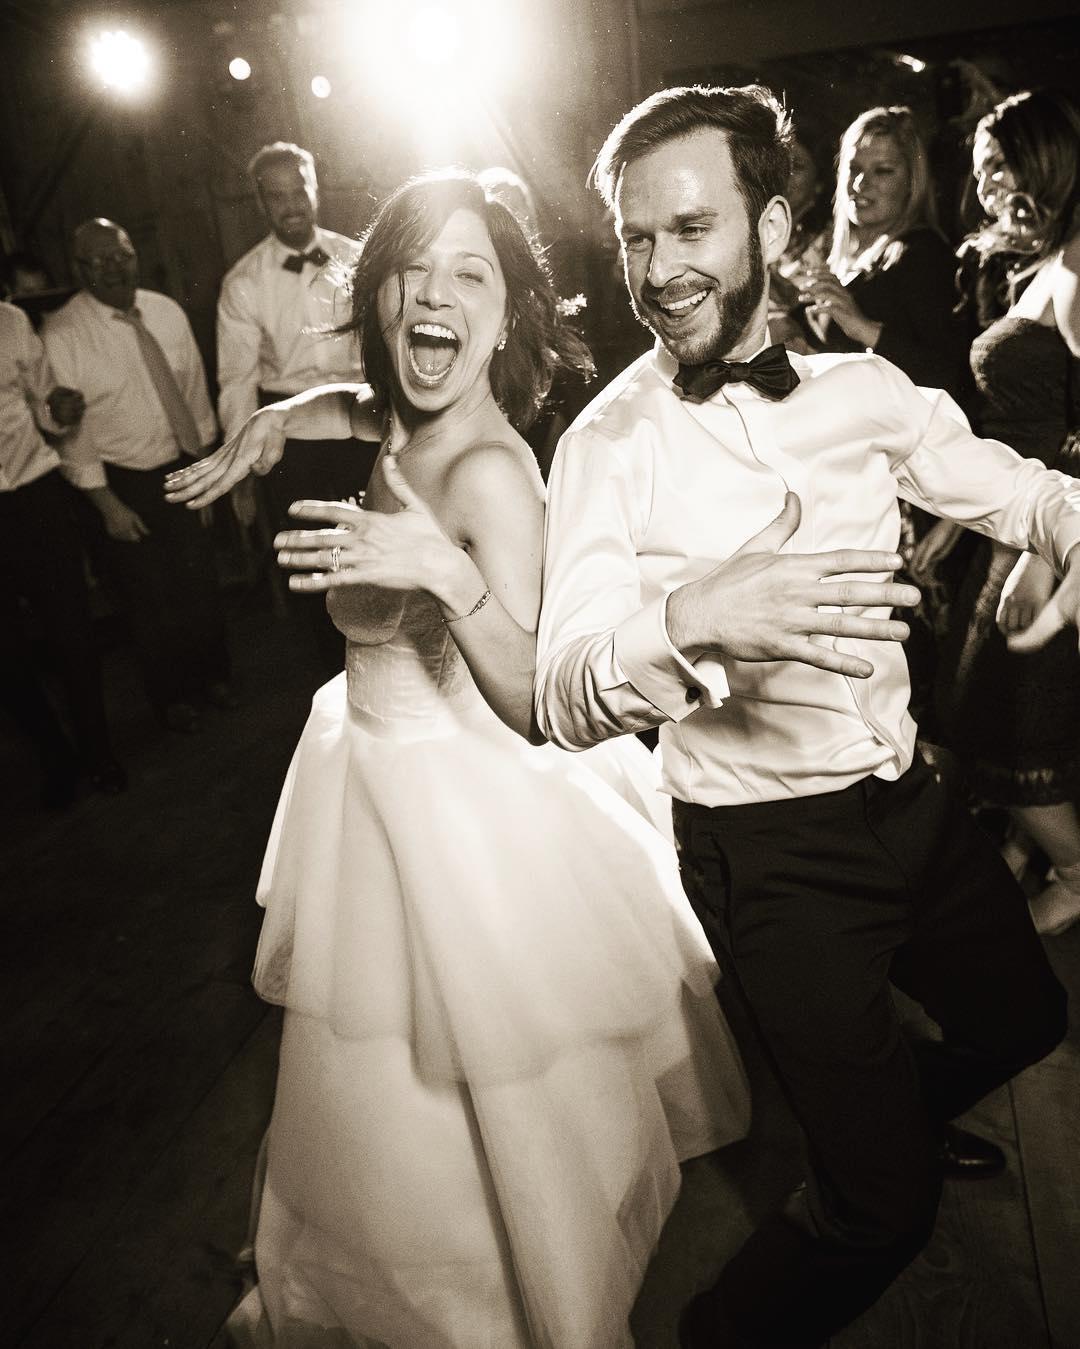 A bride and groom dancing during the open dance floor